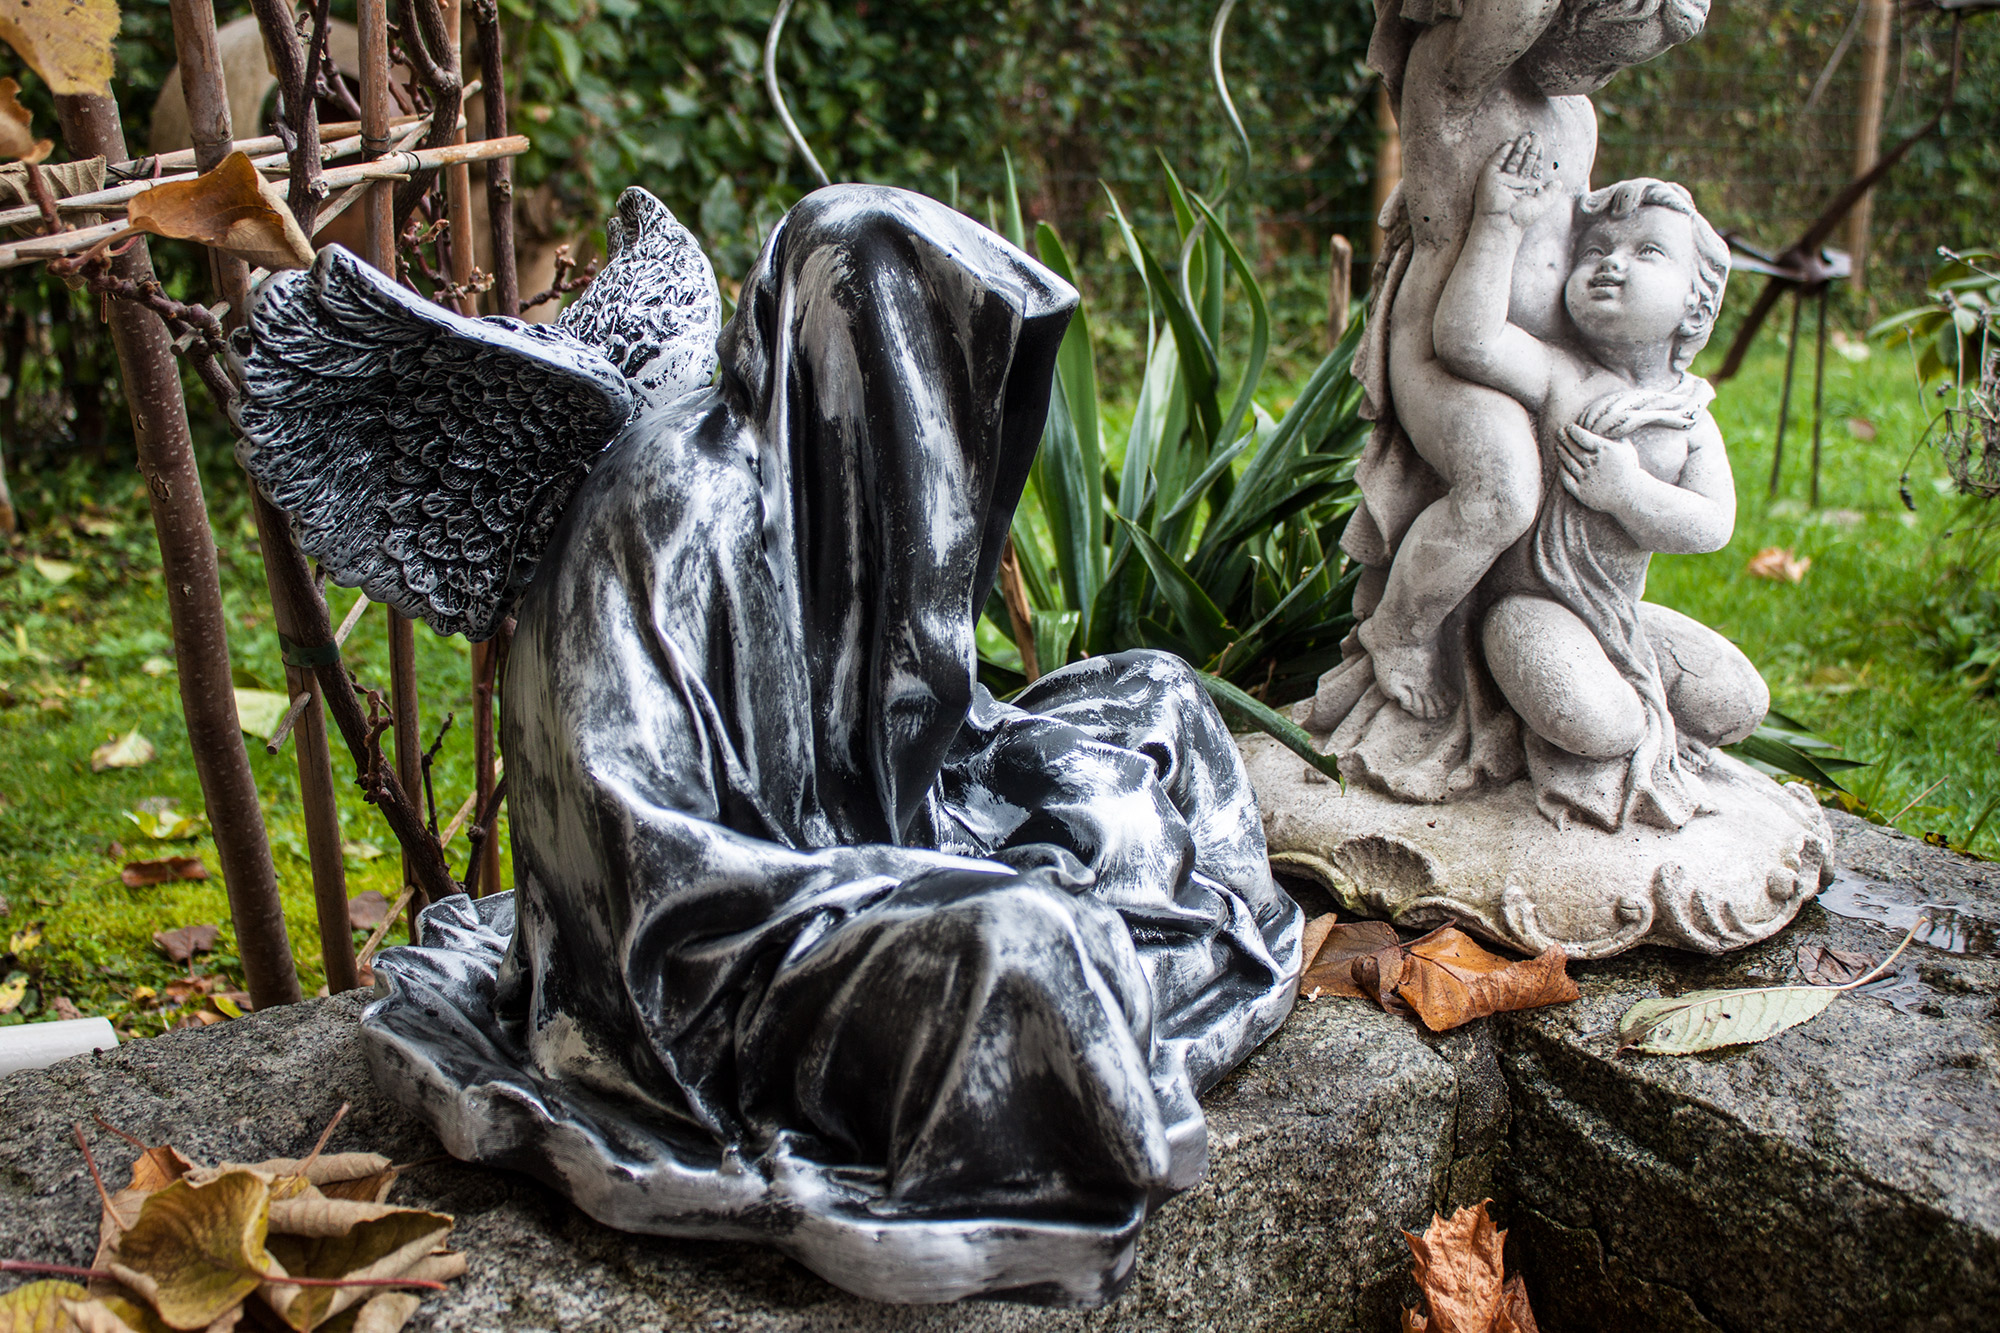 engel-guardians-of-time-ghost-wing-faceless-fine-art-contemporary-arts-modern-design-manfred-kielnhofer-kili-sculpture-statue-1333